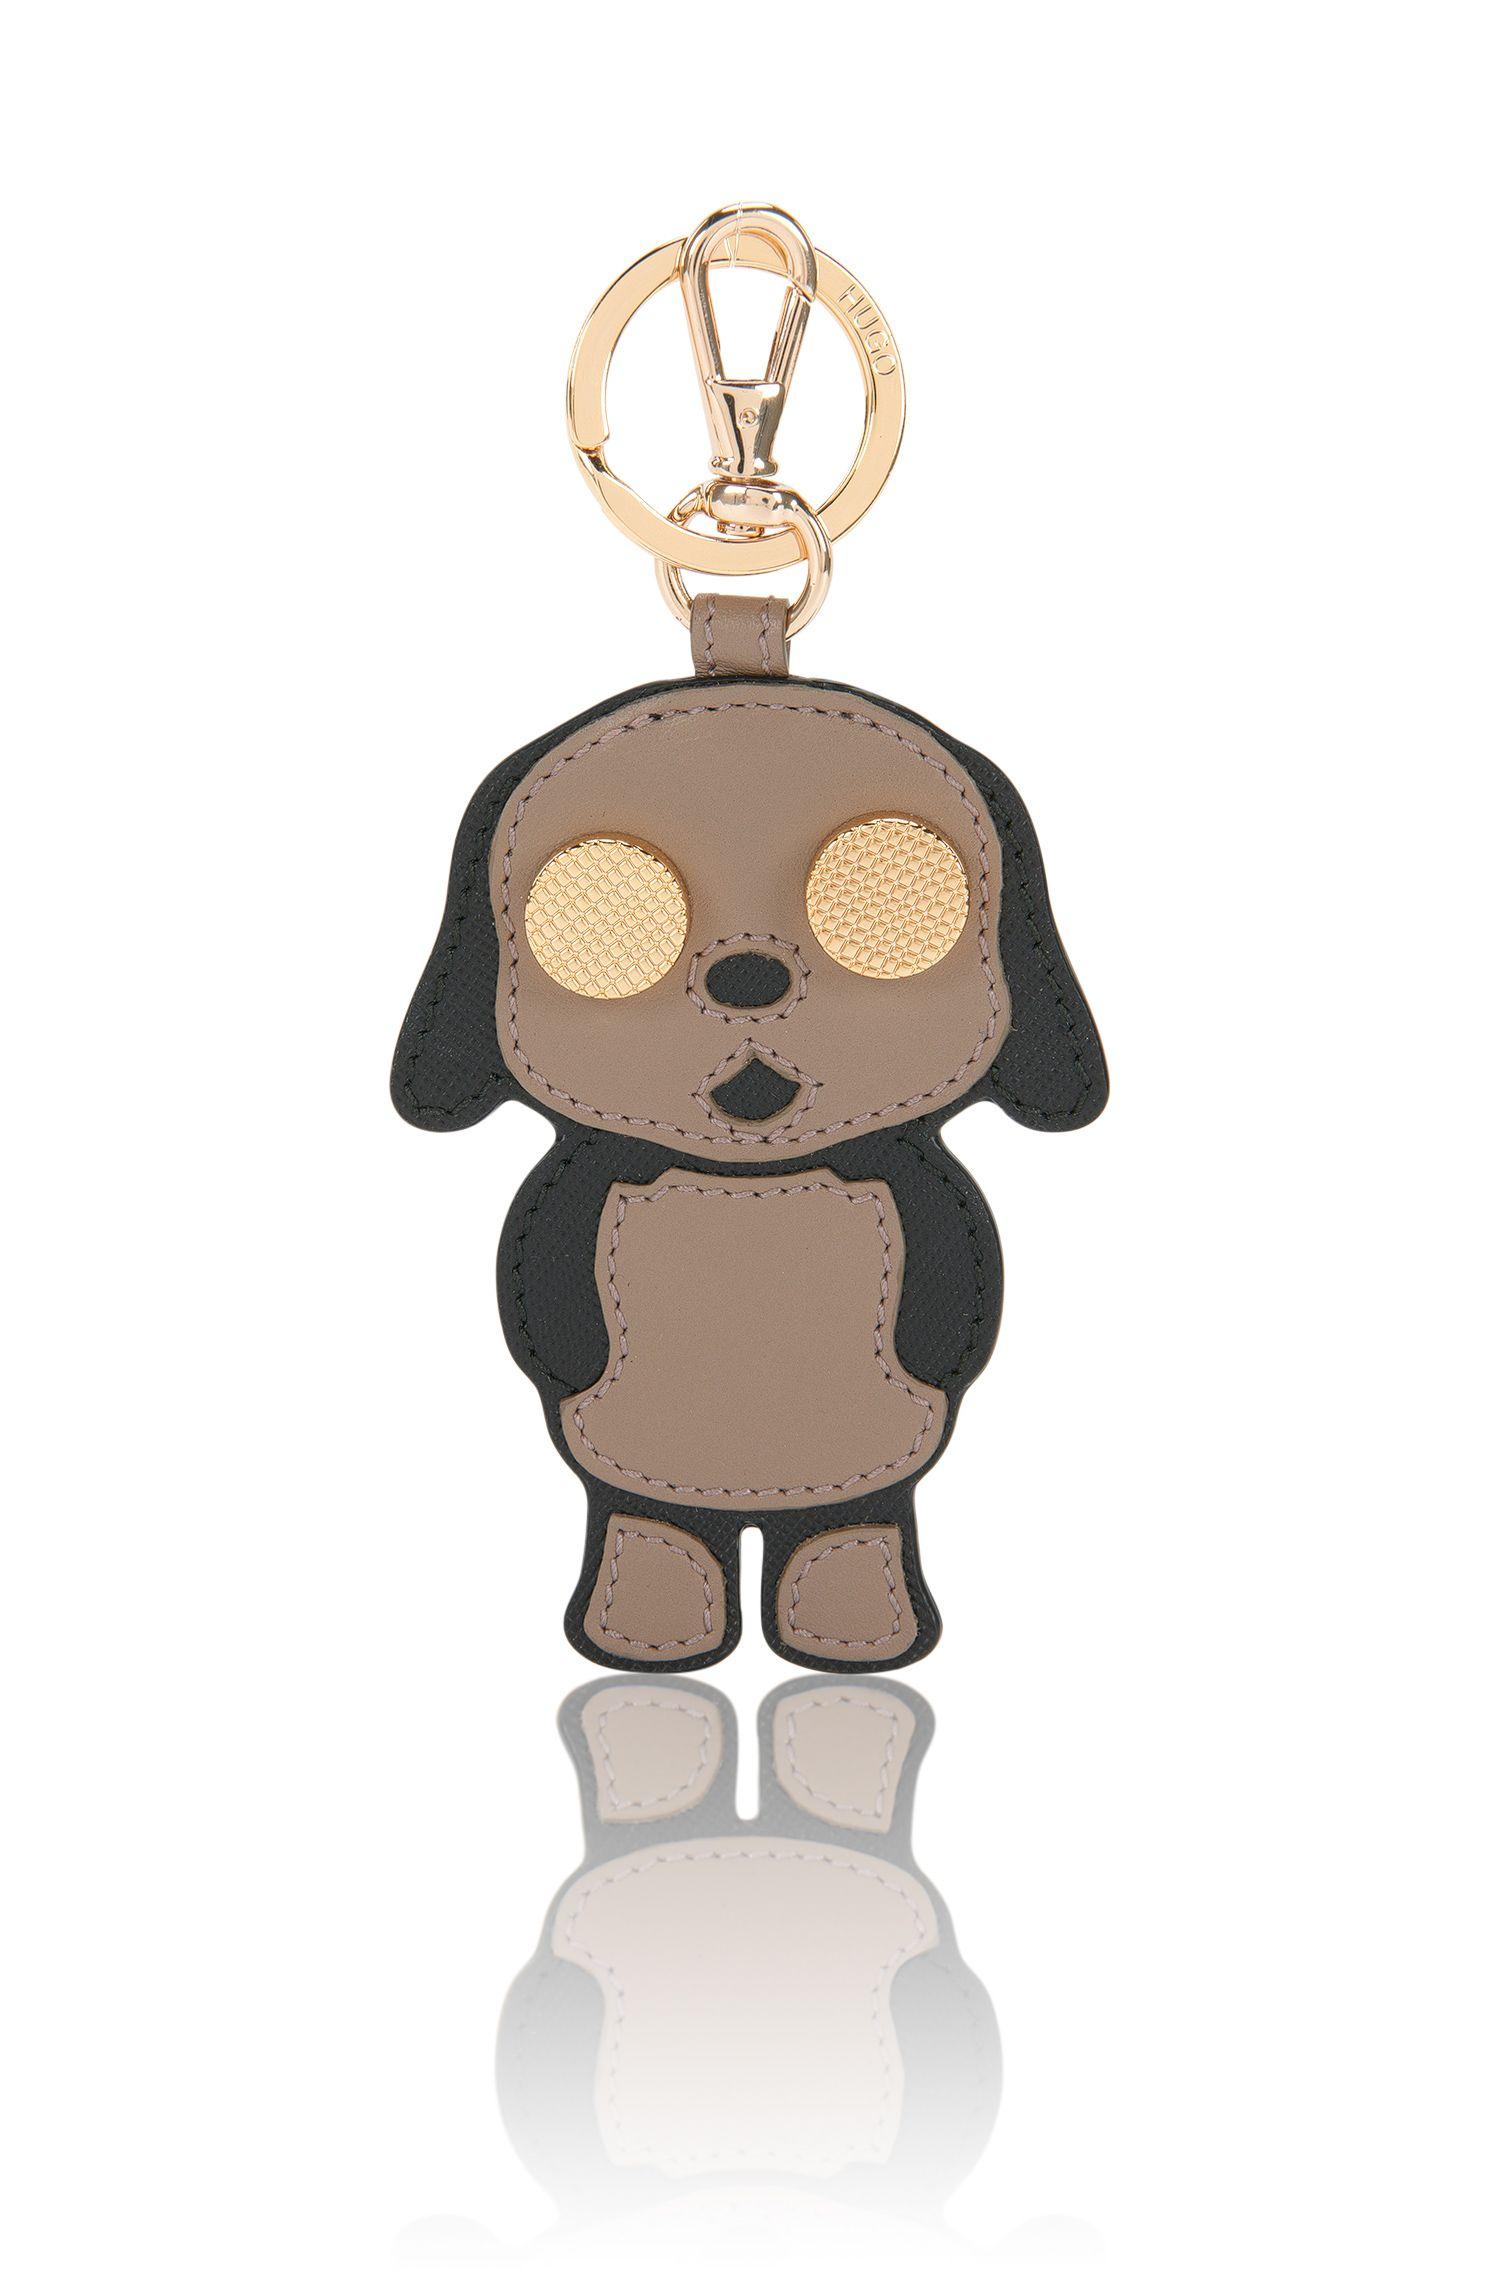 Schlüsselanhänger aus Leder mit Hunde-Motiv: 'Kim'